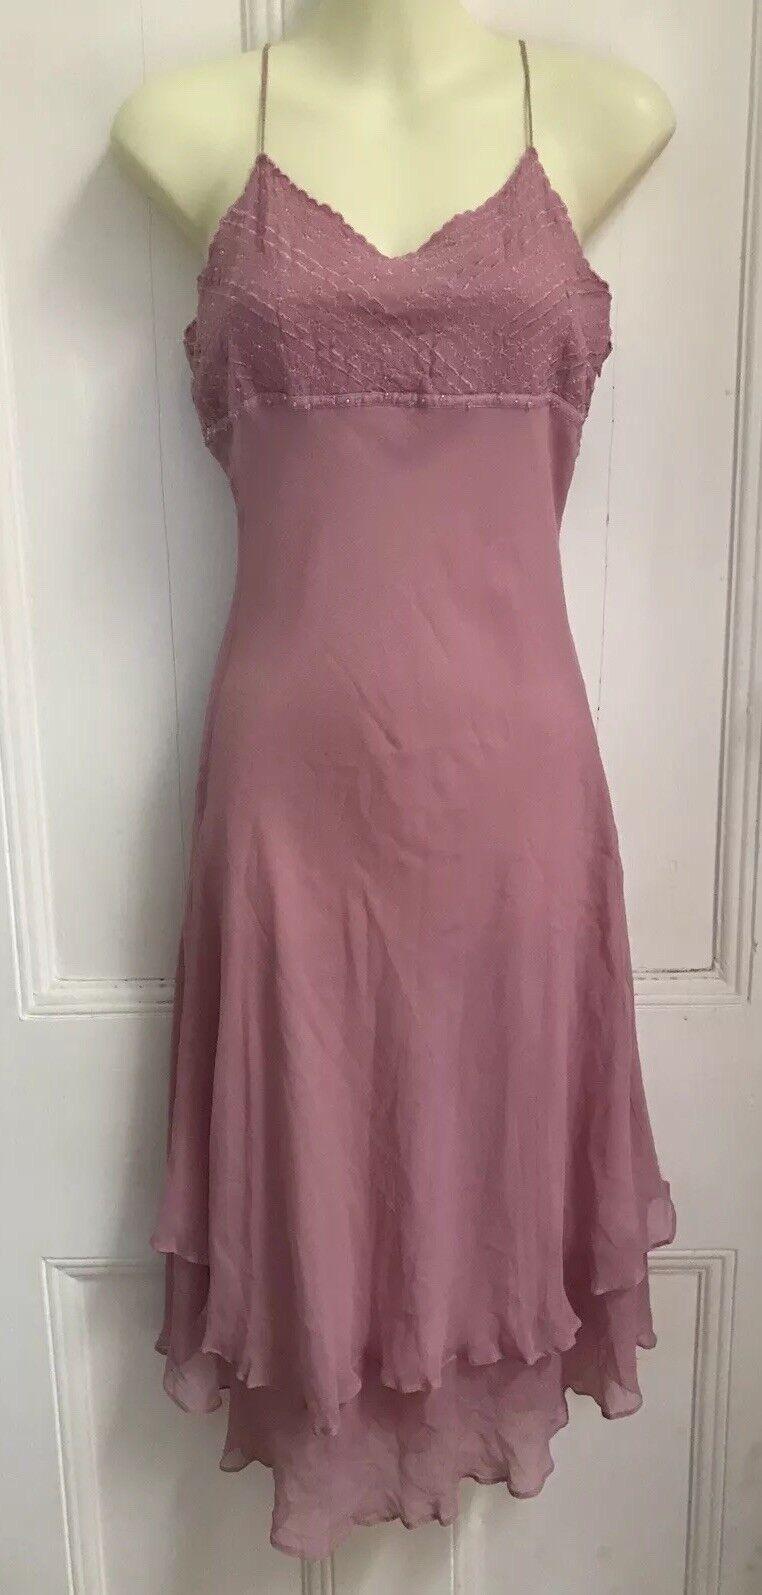 MARNI Silk Dress Embroidered Bids Size Italian Small 38 RRP Gatsby 1920